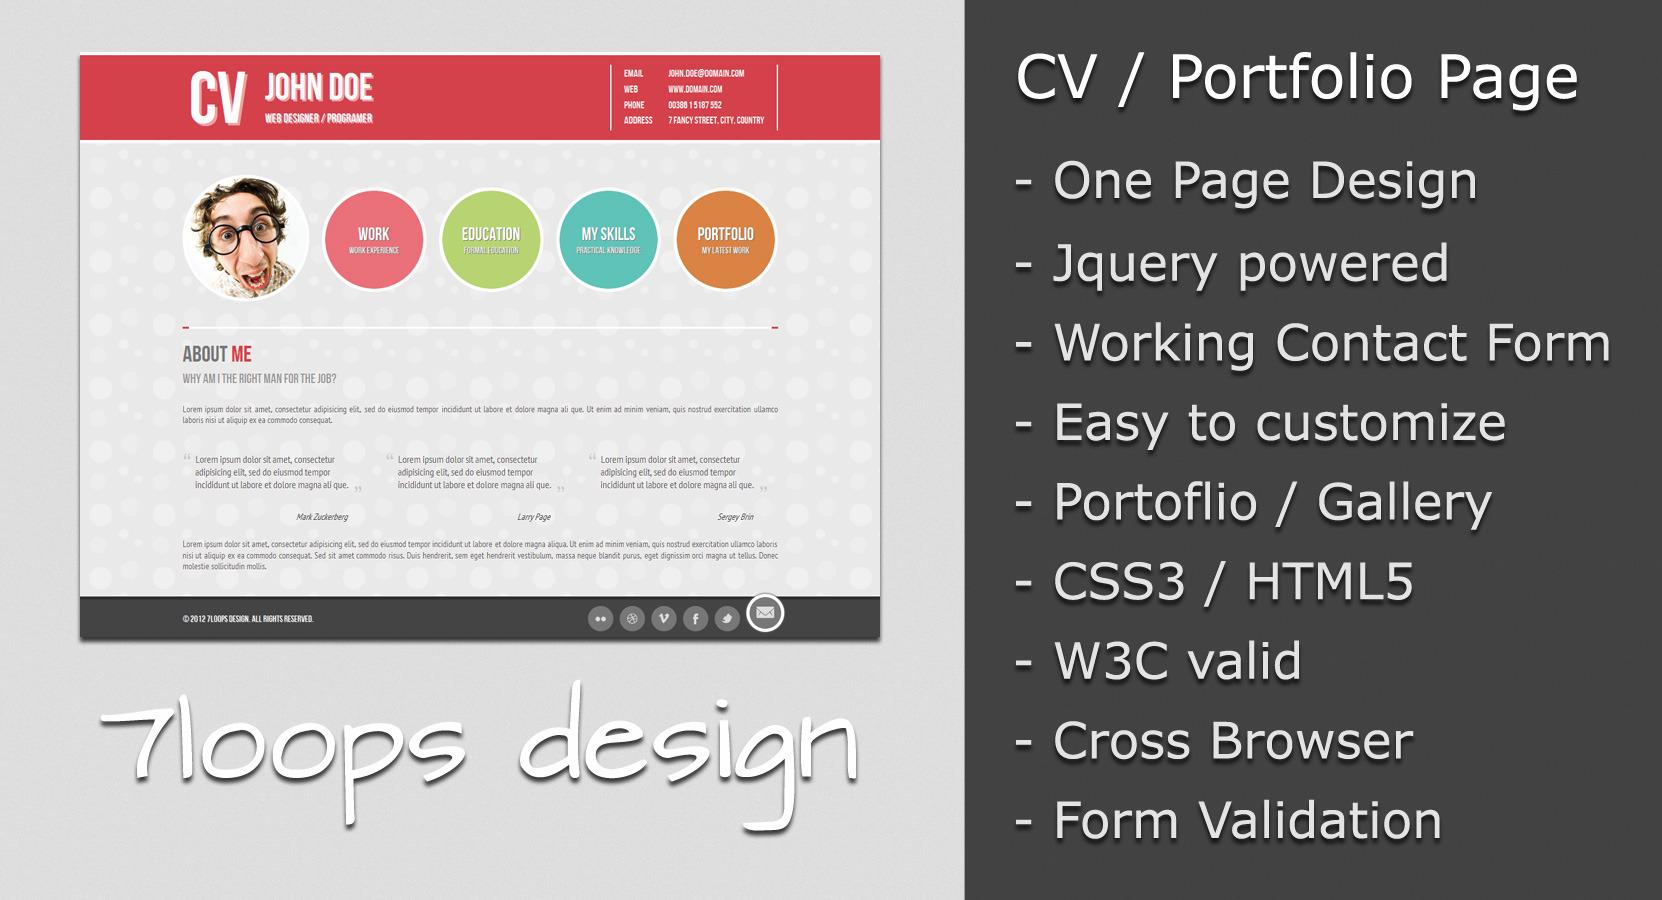 Symplicity CV / Portfolio Page